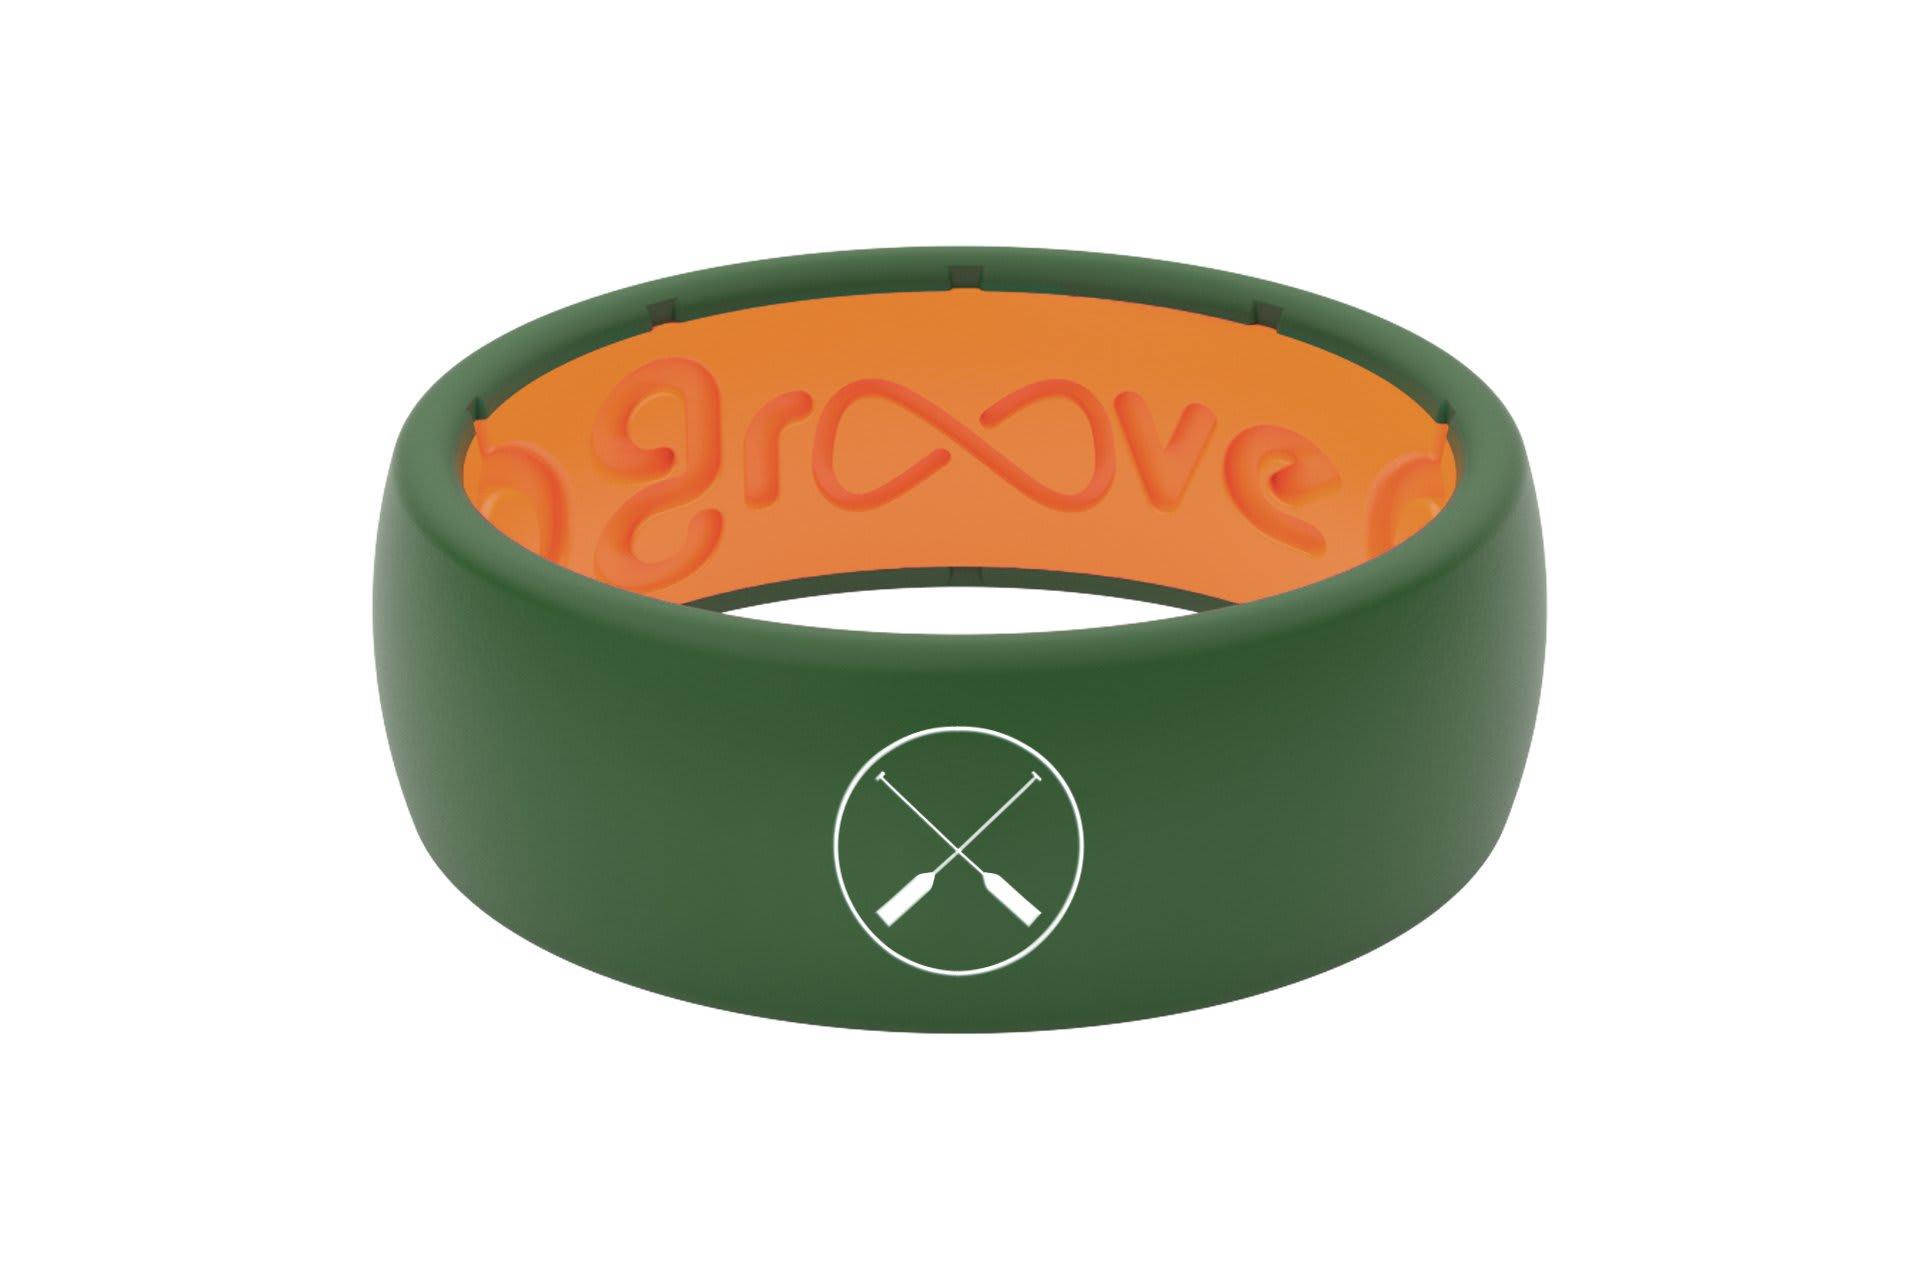 Original Custom Oars Moss Green/Orange - Groove Life